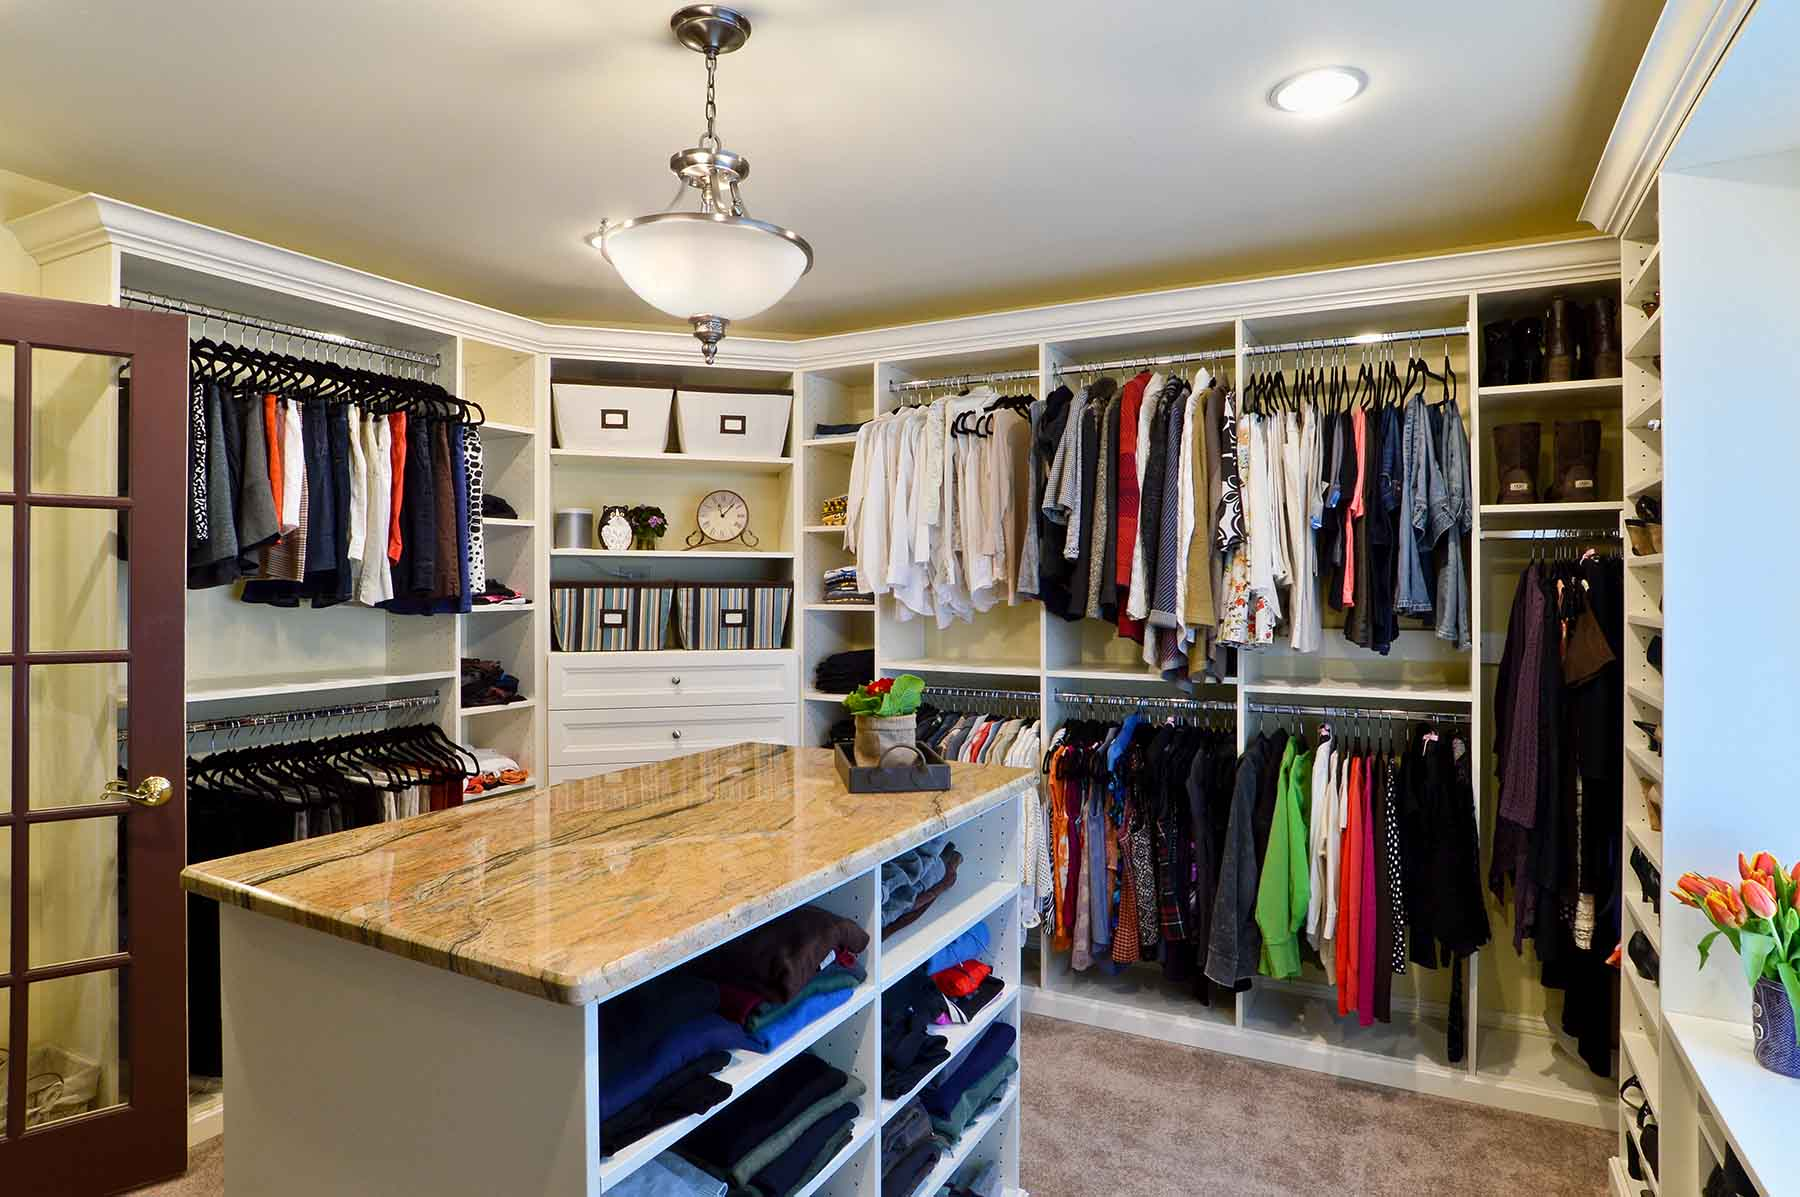 Closet organization system in walk-in closet